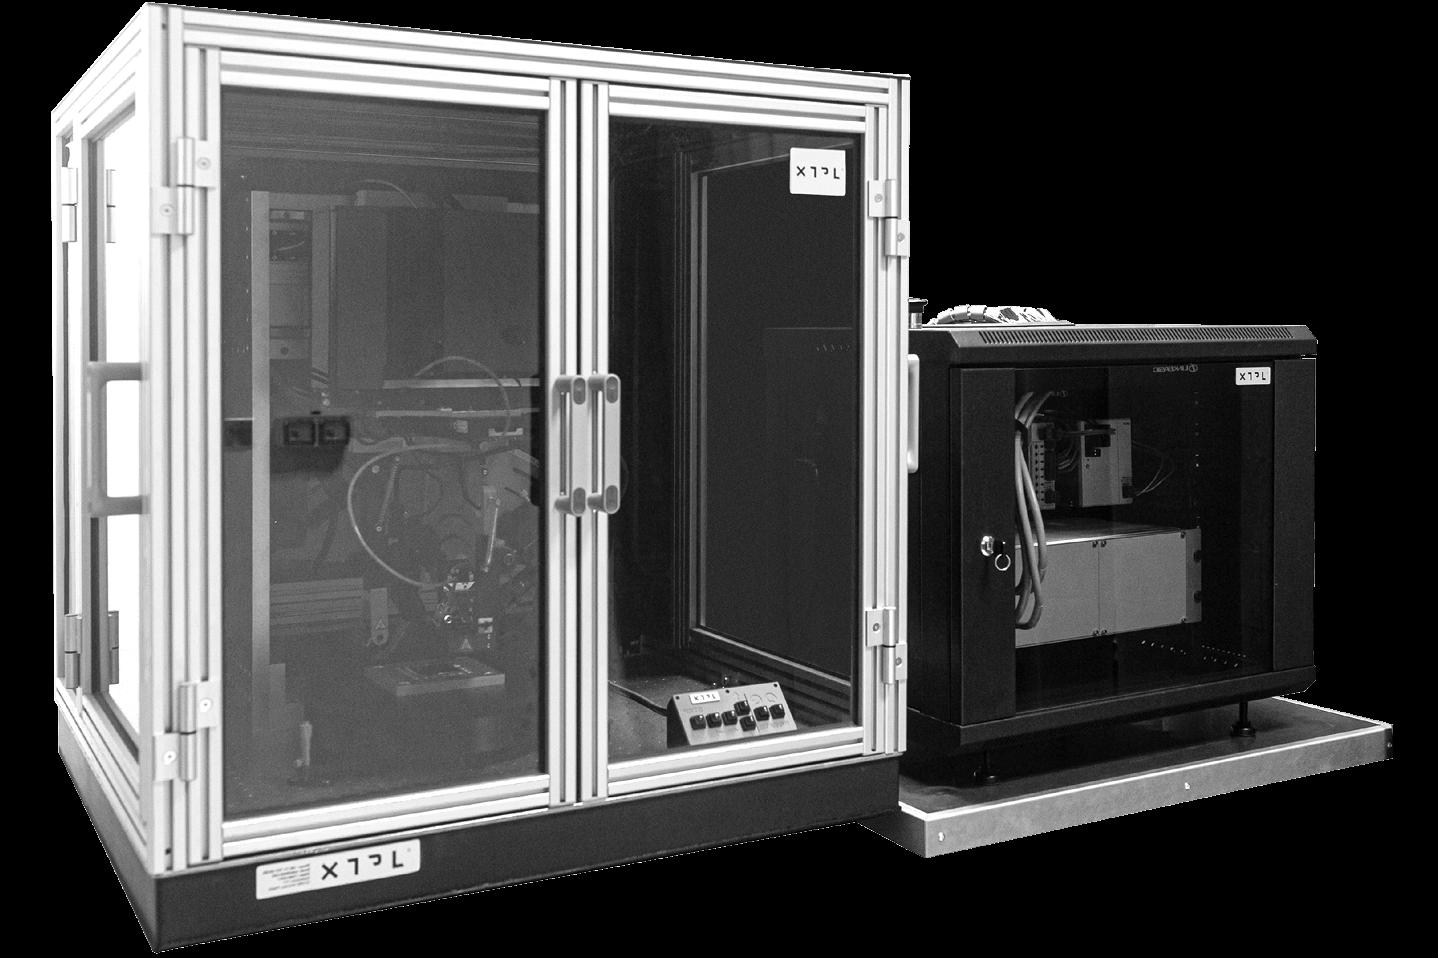 XTPL® DELTA PRINTING SYSTEM